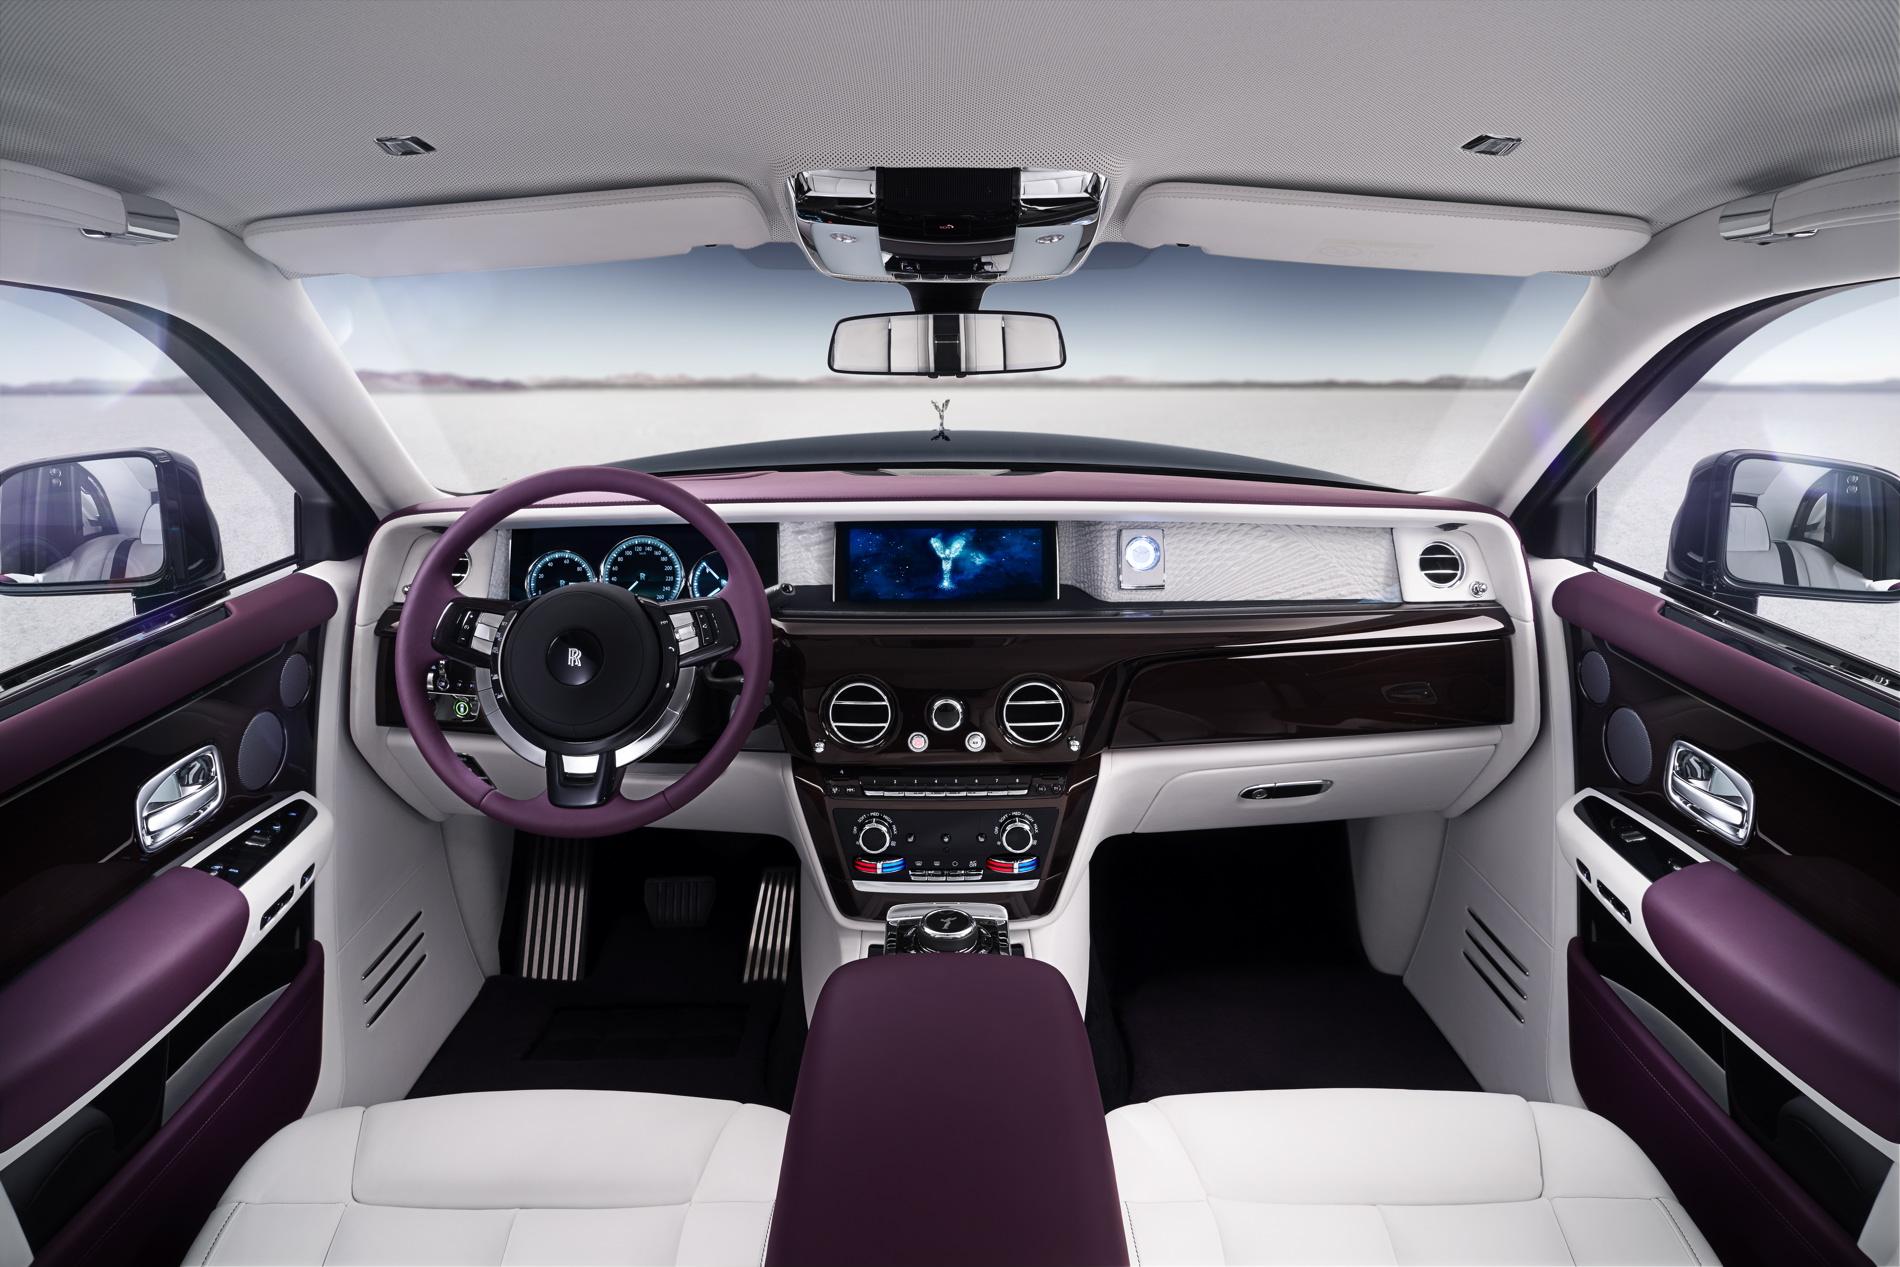 New Rolls Royce >> New Rolls Royce Phantom Extended Wheelbase Photo Gallery